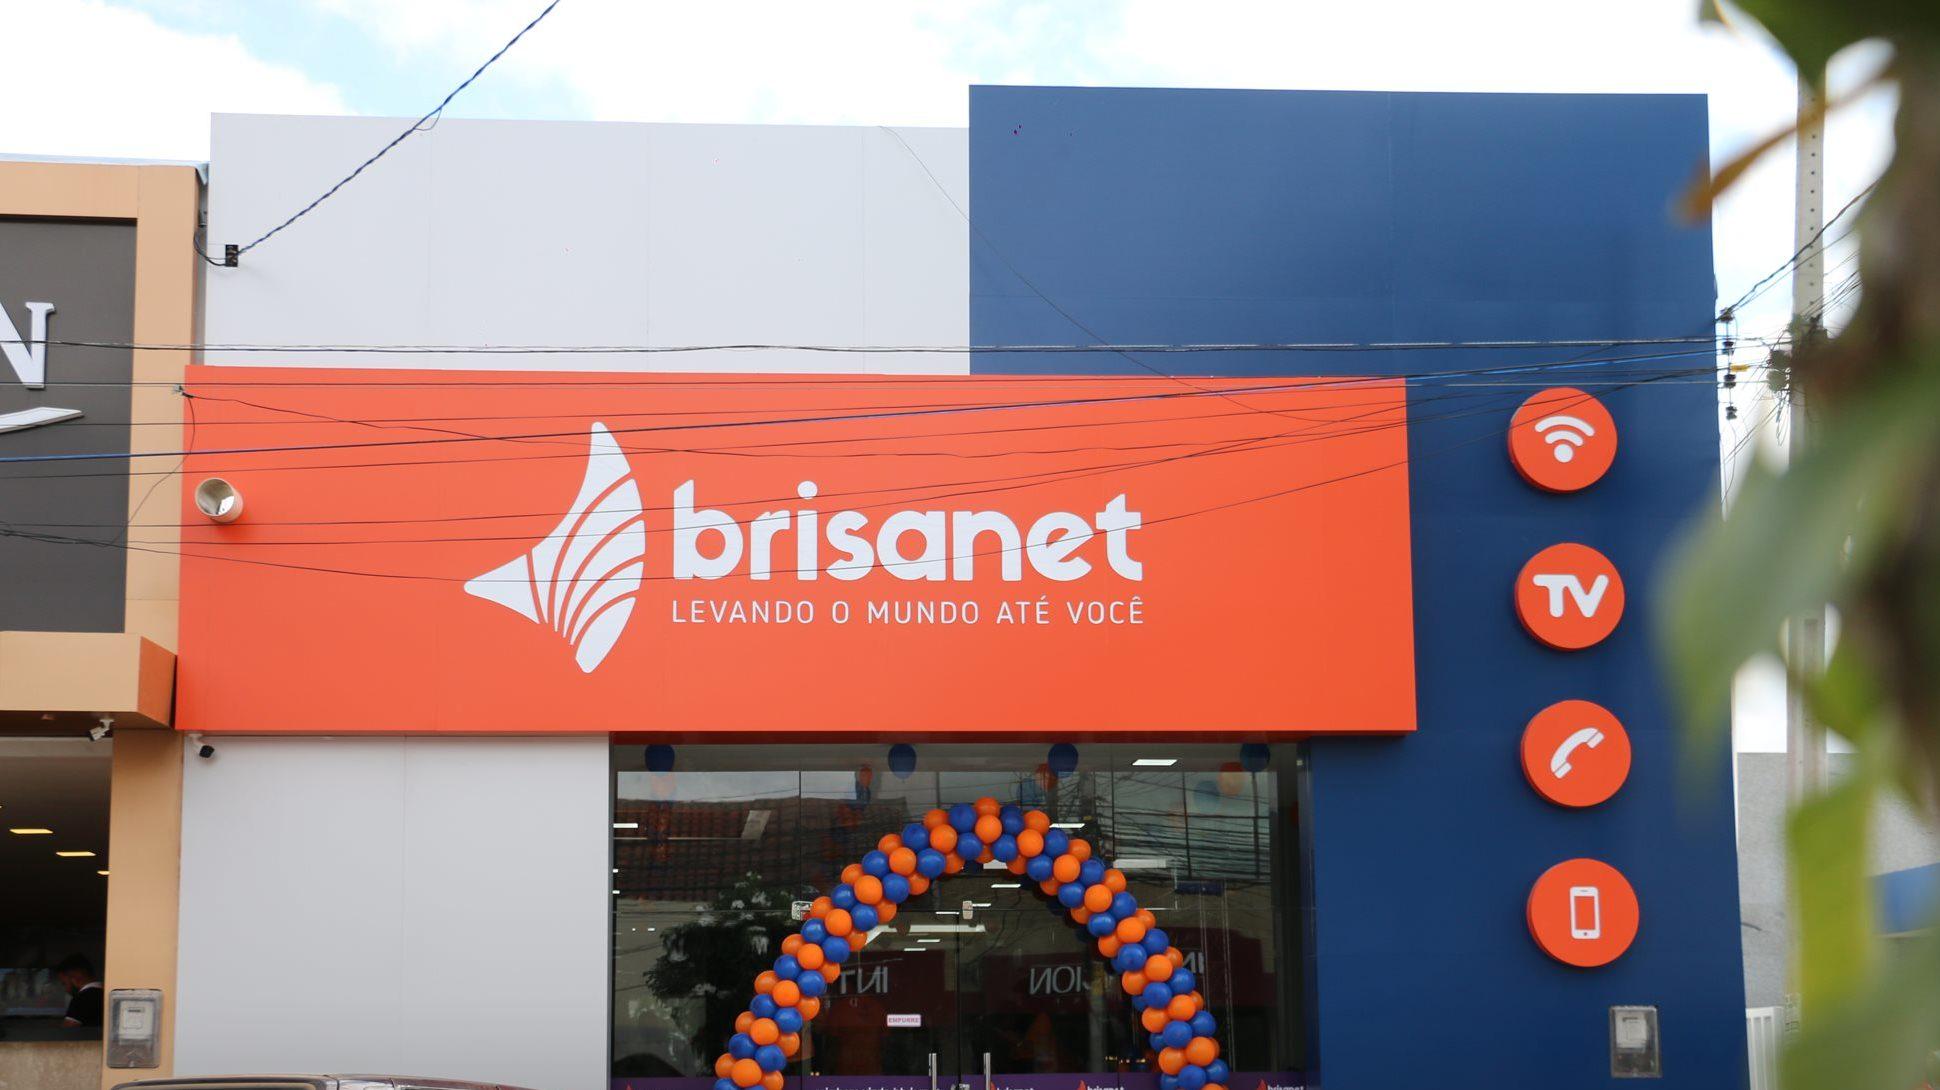 Brisanet (BRIT3) registra pedido de IPO junto à CVM brisanet Brisanet (BRIT3) registra pedido de IPO junto à CVM brisanet ipo